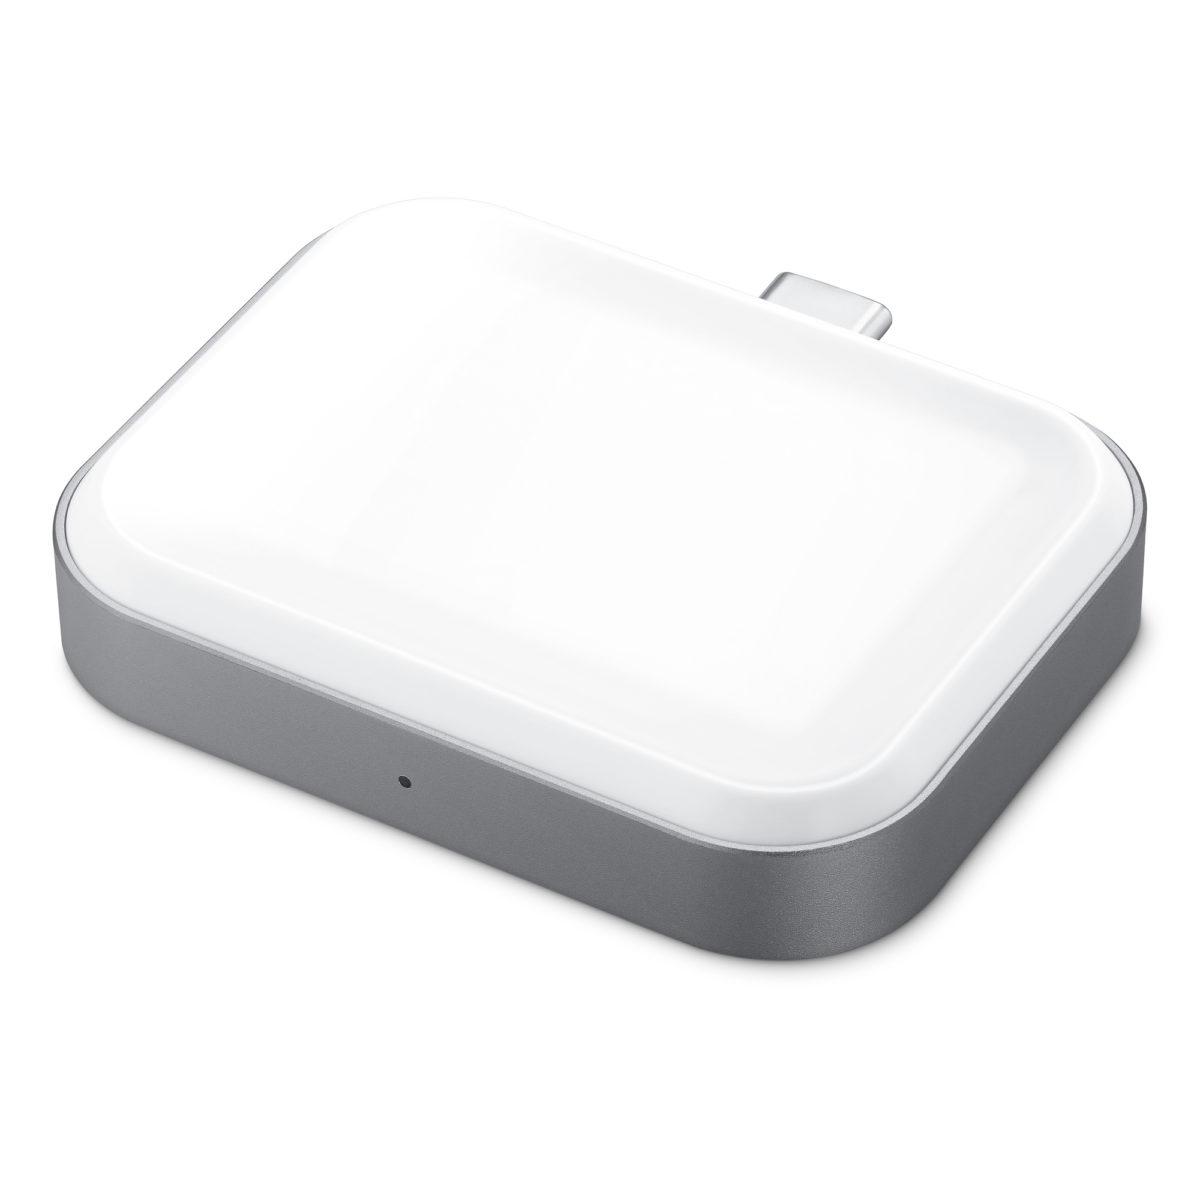 Satechi USB-C Watch AirPods 充電器相當小巧,一邊是 AirPods/AirPods Pro 無線充電盒用的 Qi 充電器。